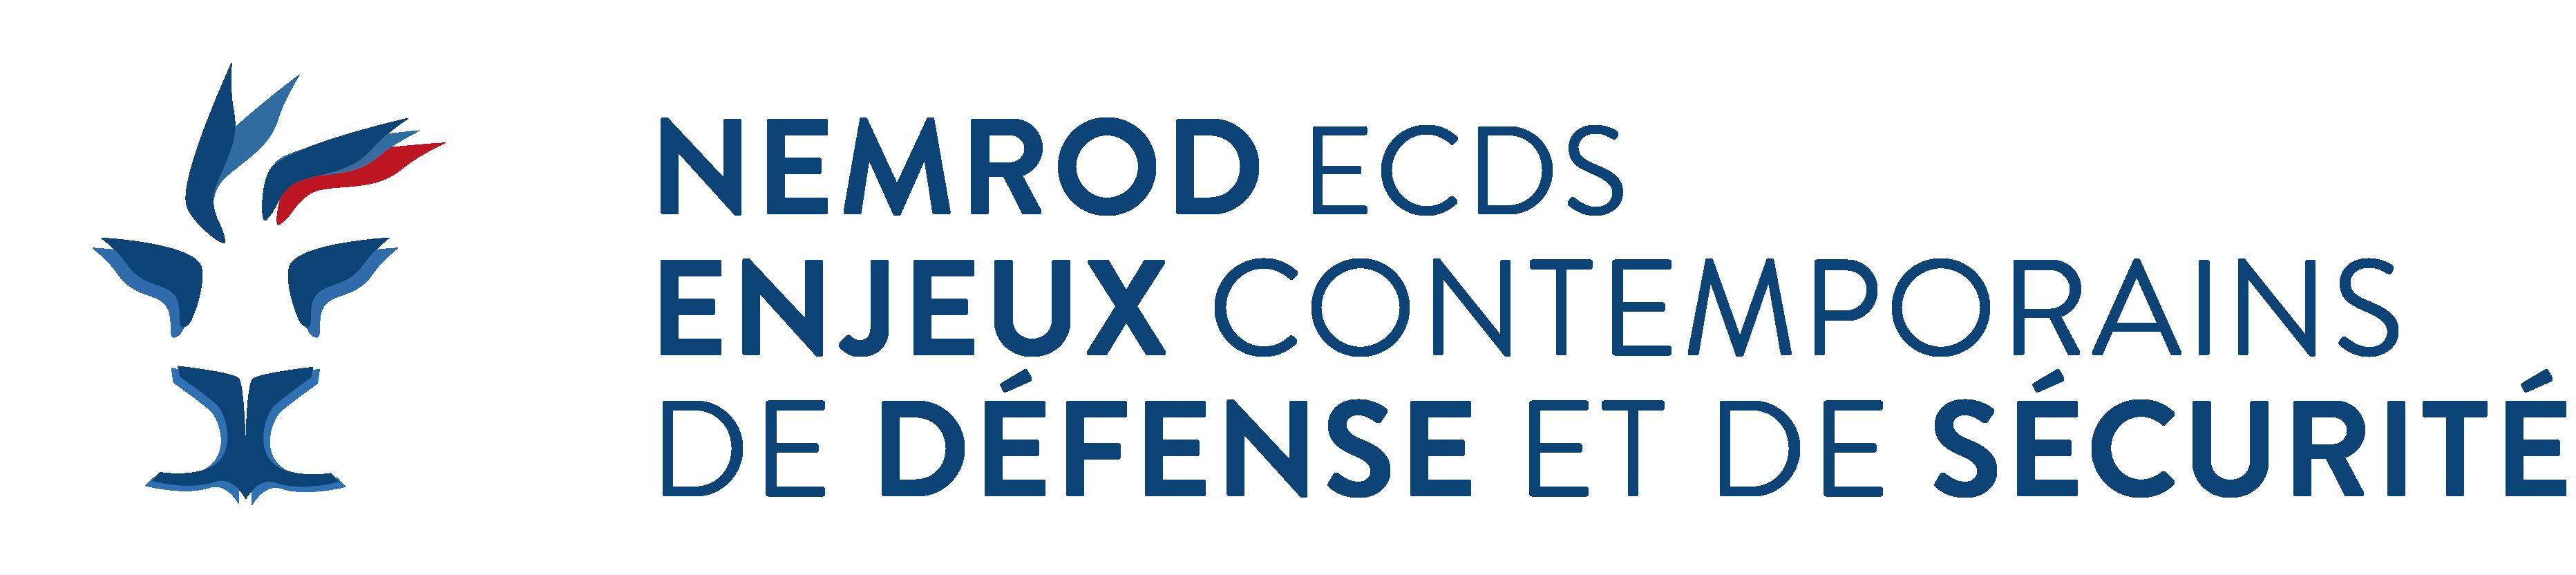 Nemrod ECDS